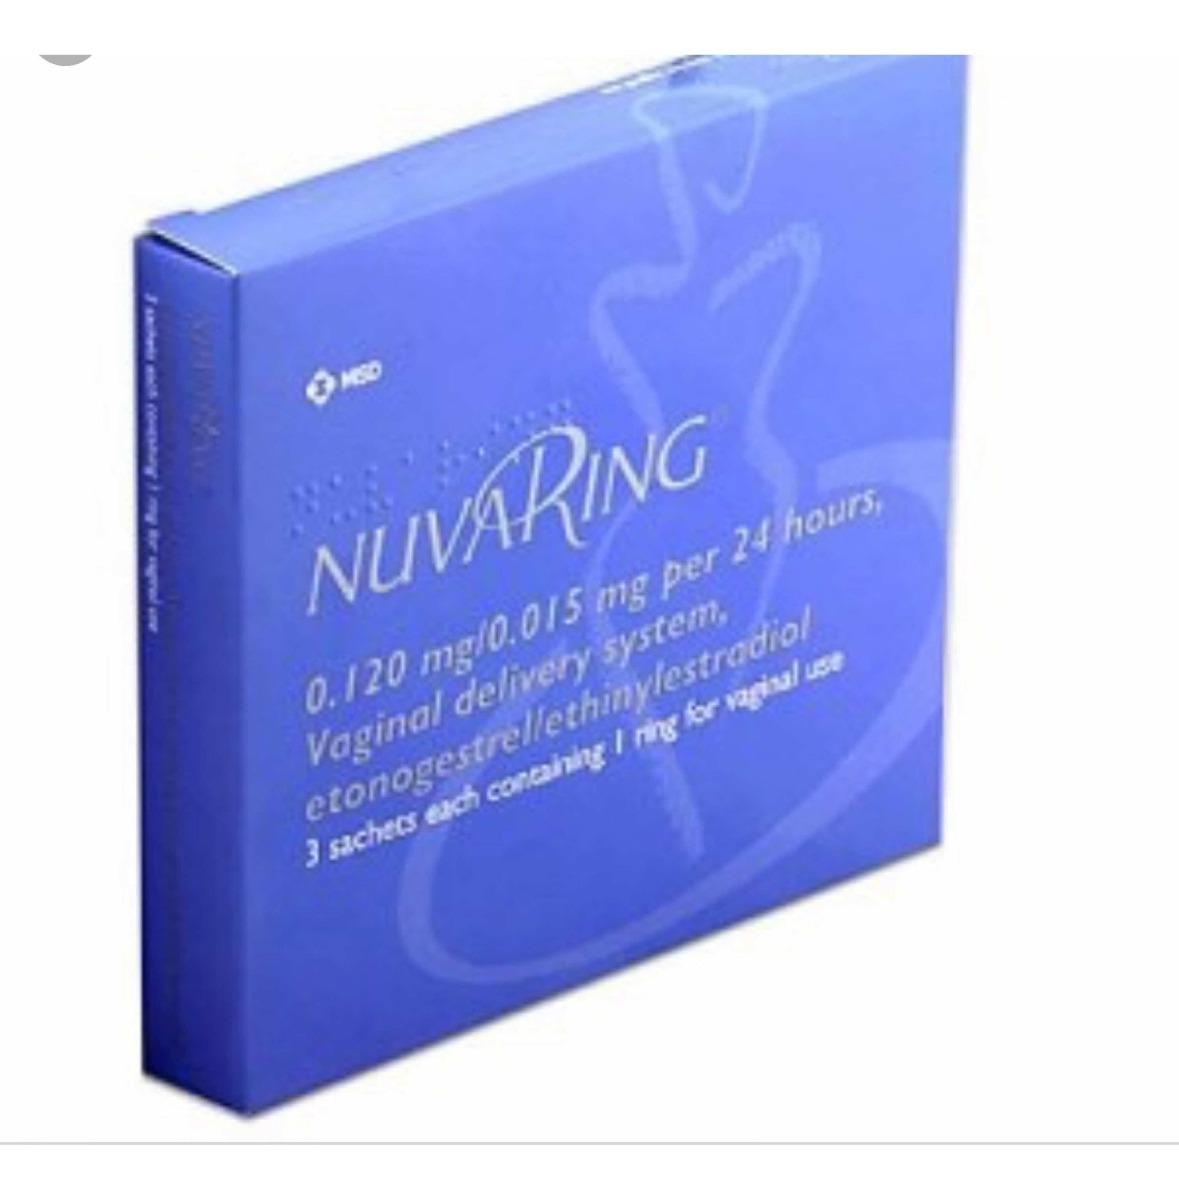 efectos secundarios NuvaRing